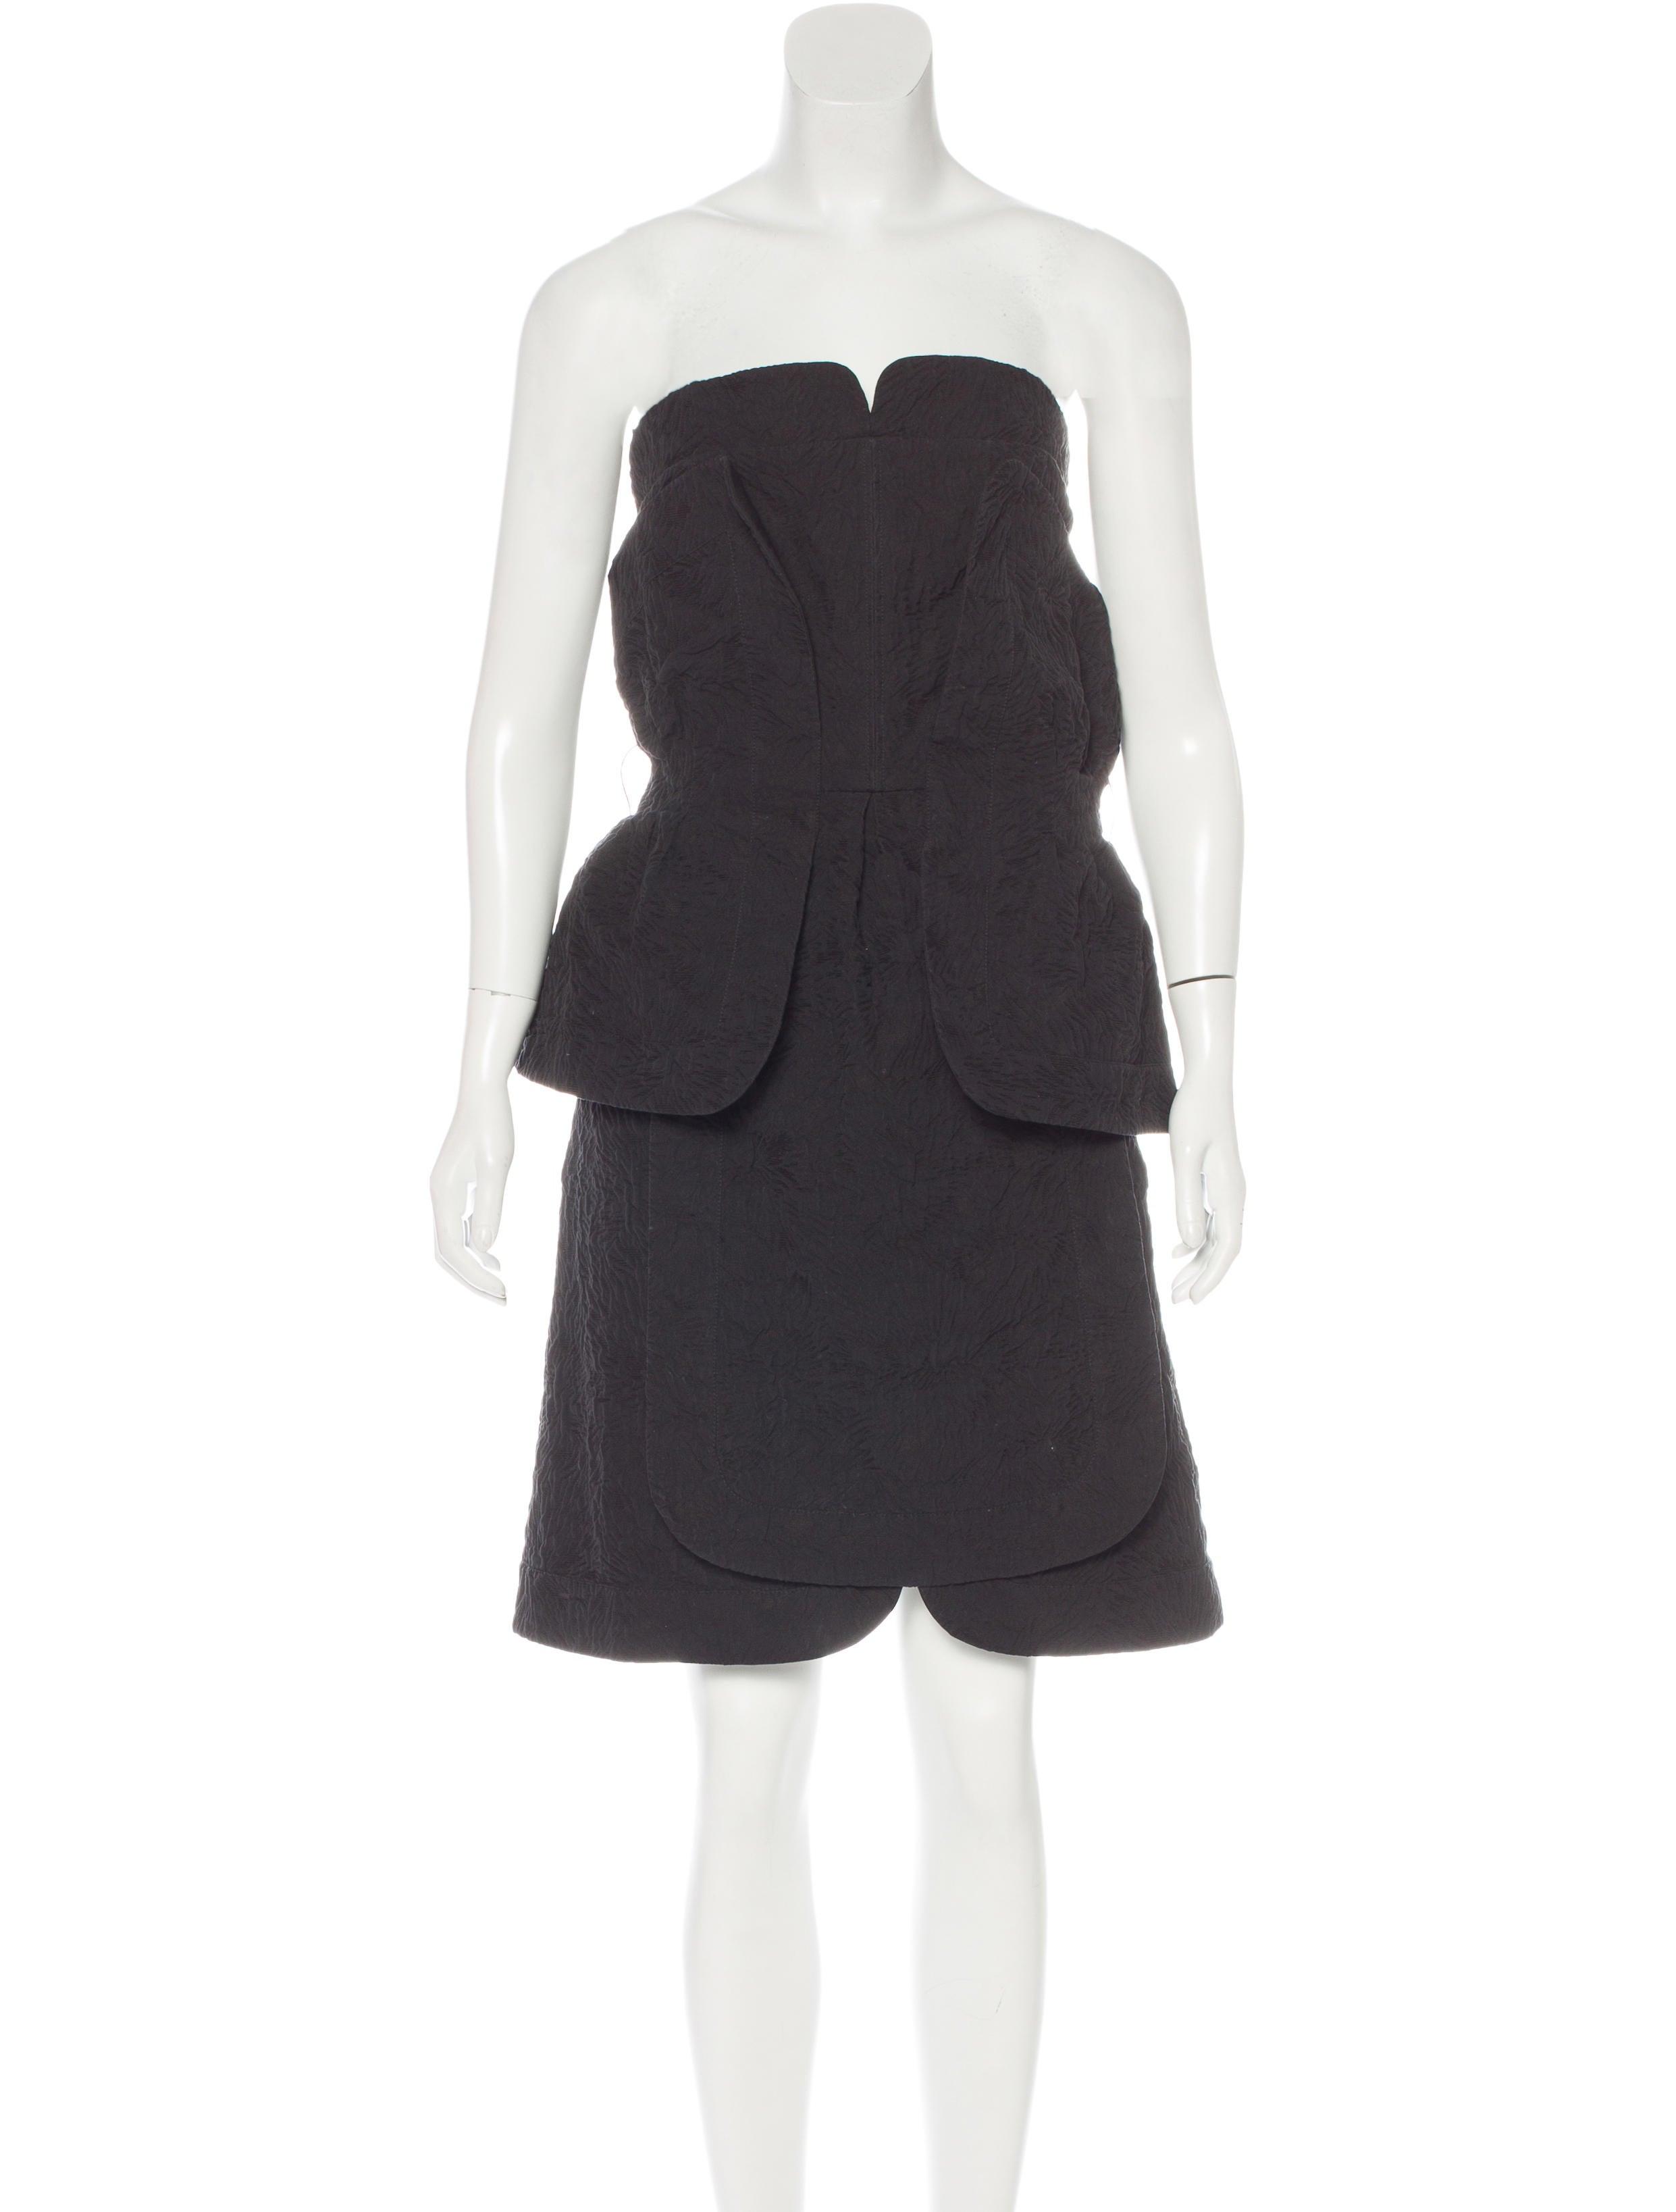 fendi strapless peplum dress clothing fen52390 the